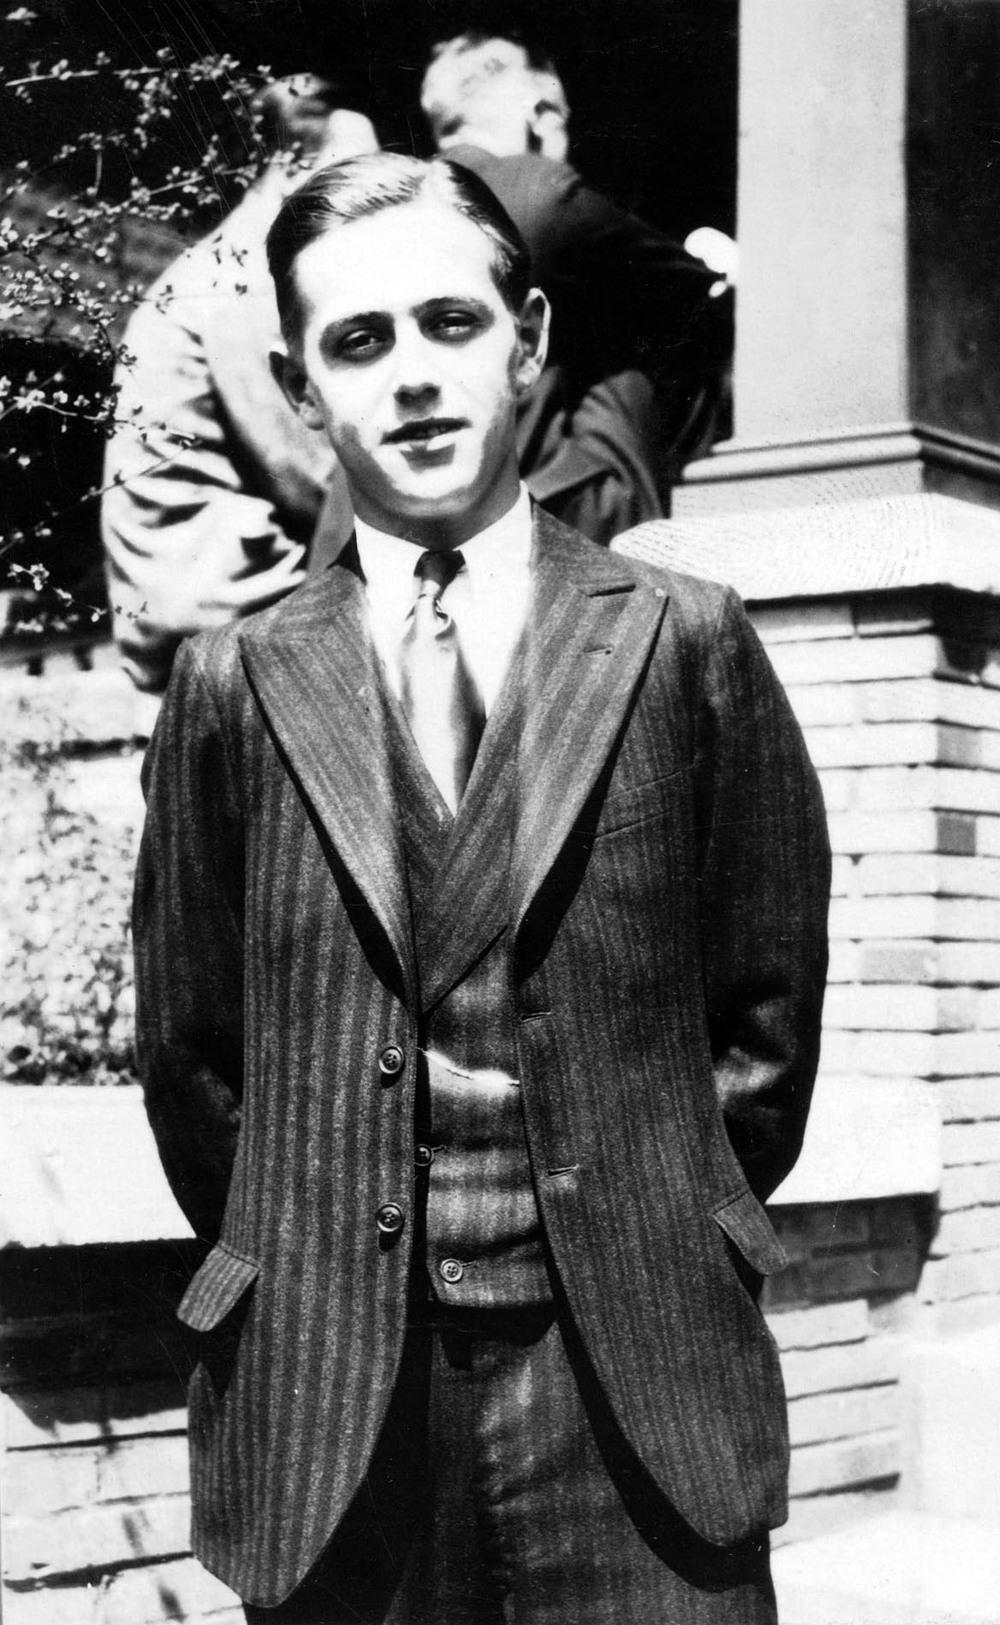 C. Edgar Newcomer 1932